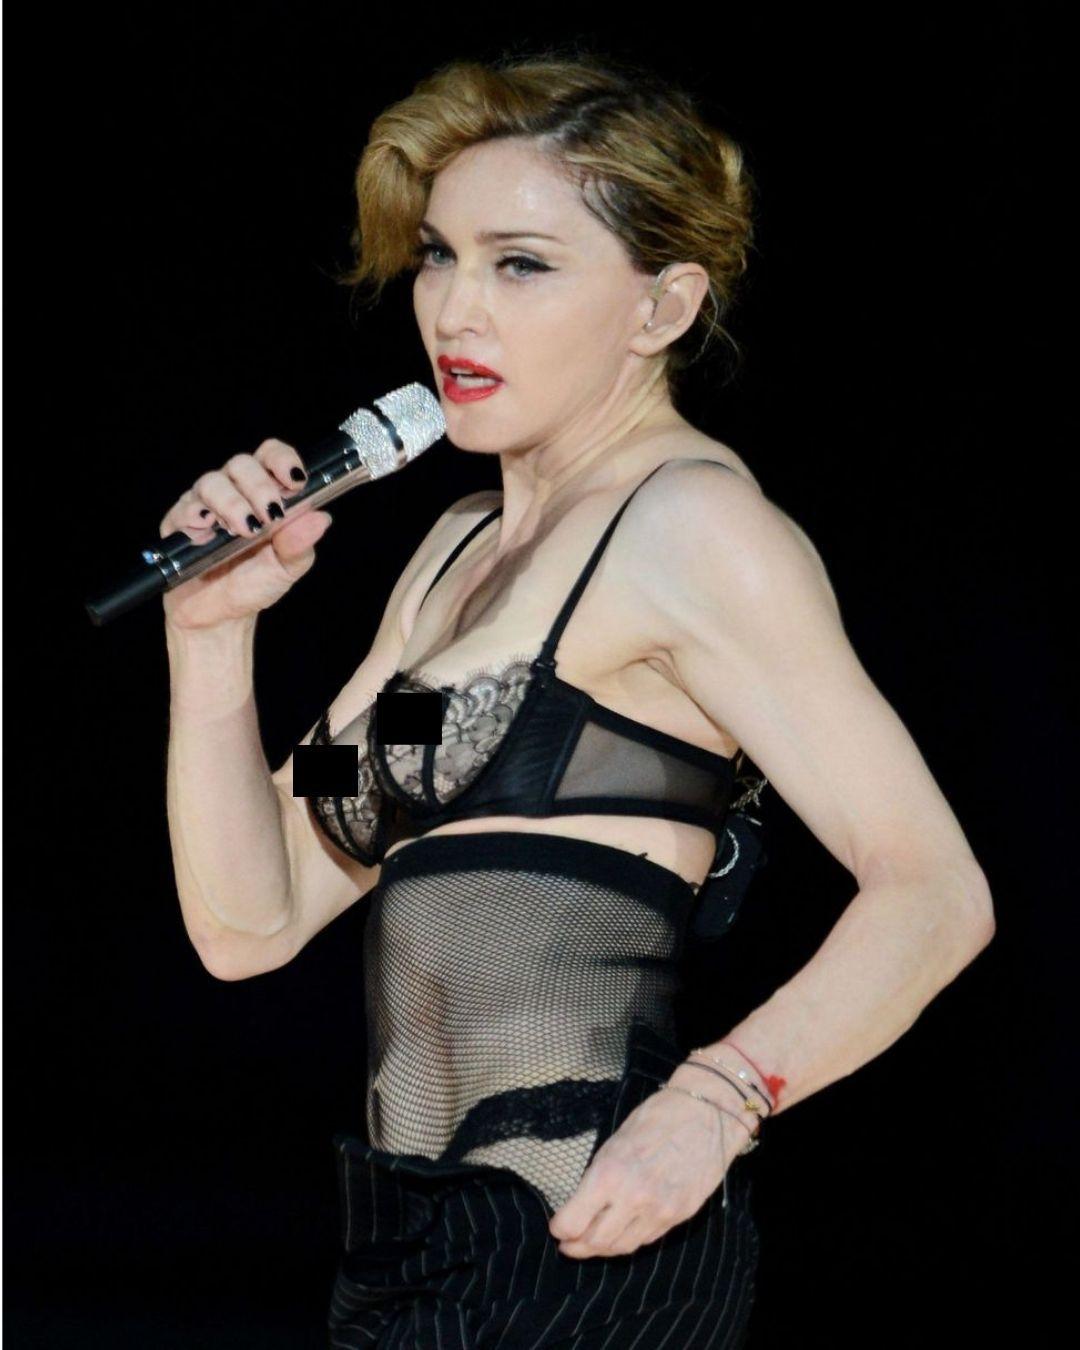 Gaya Seksi Madonna Paling Viral Sepanjang Masa, Berani Umbar Tubuh